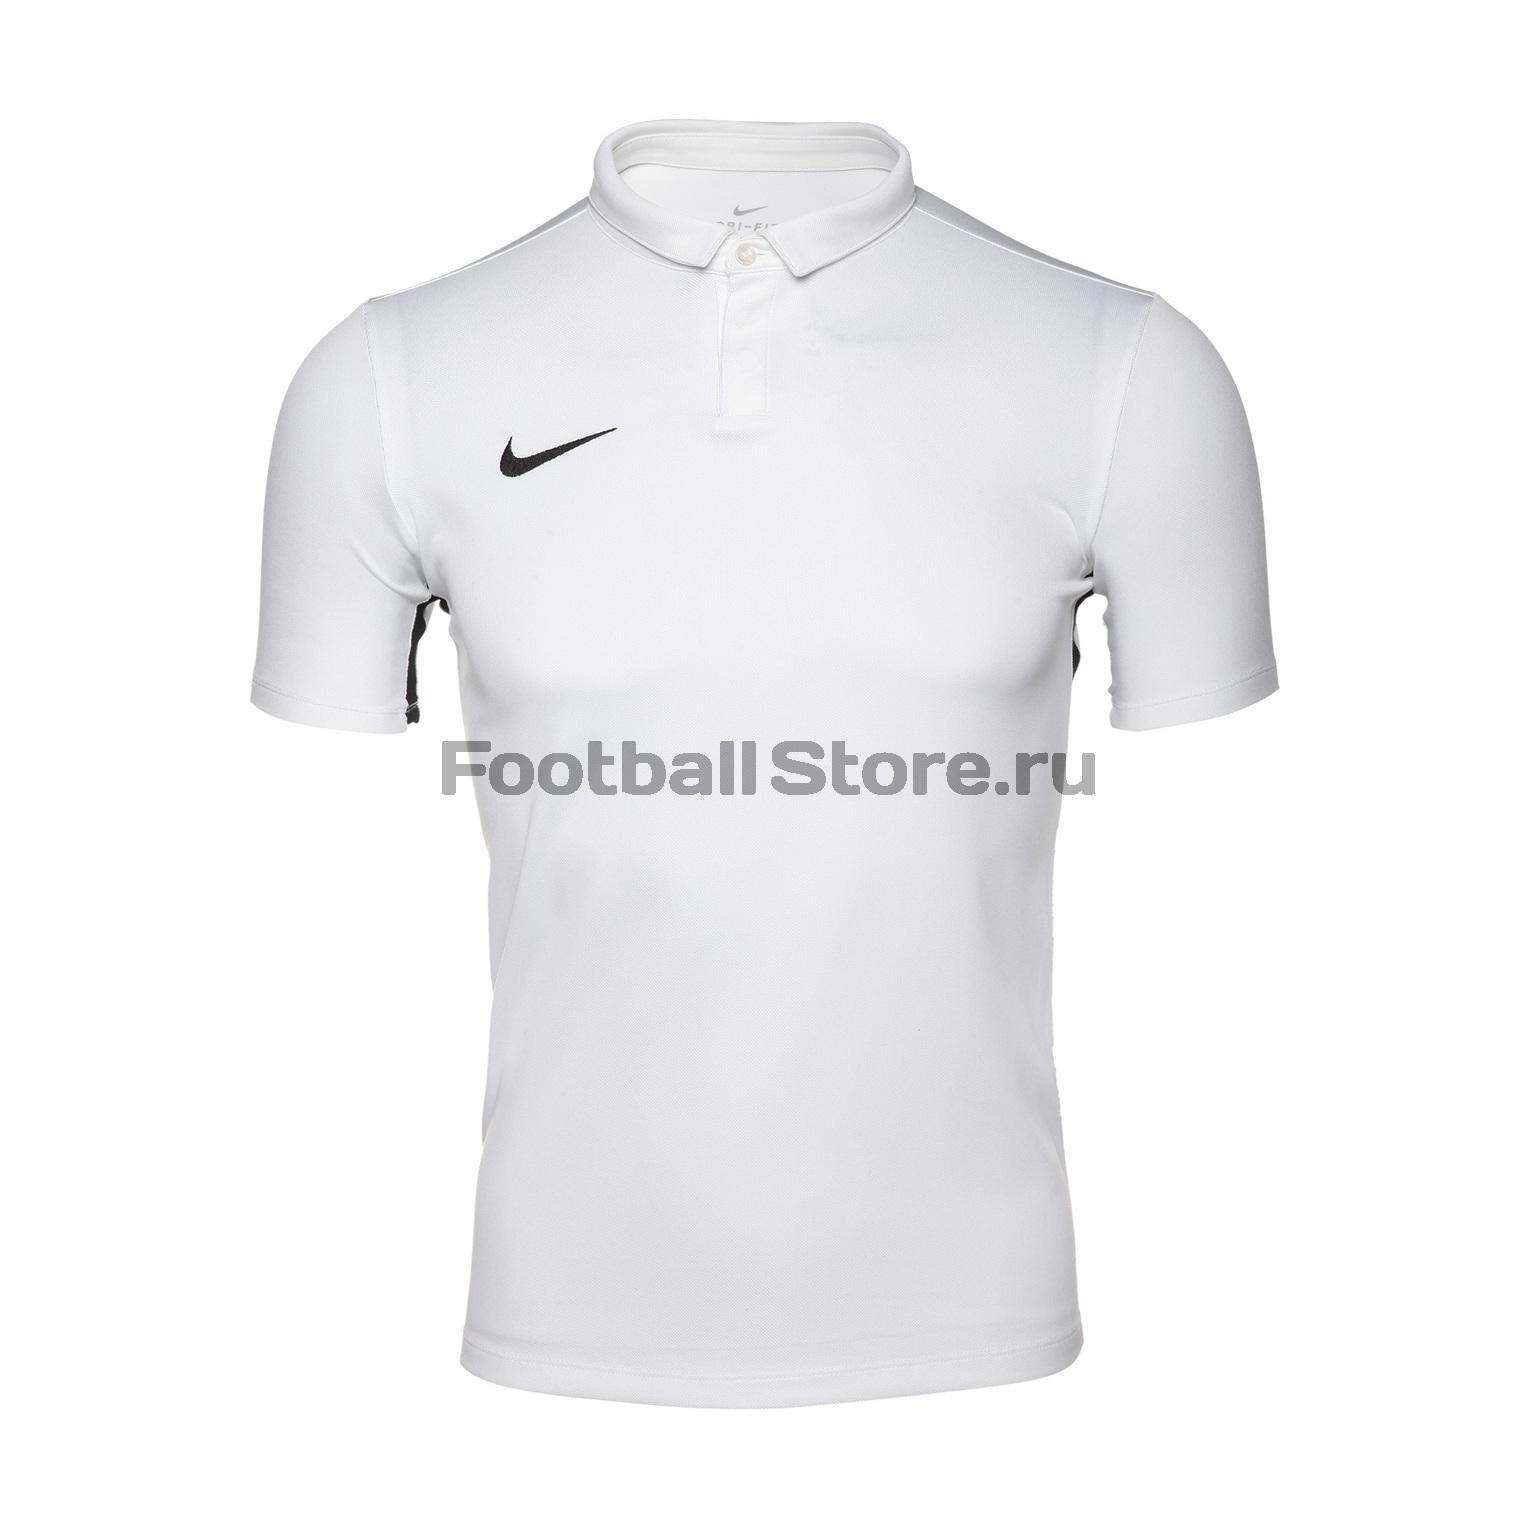 Поло Nike YTH Academy18 Dry Polo 899991-100